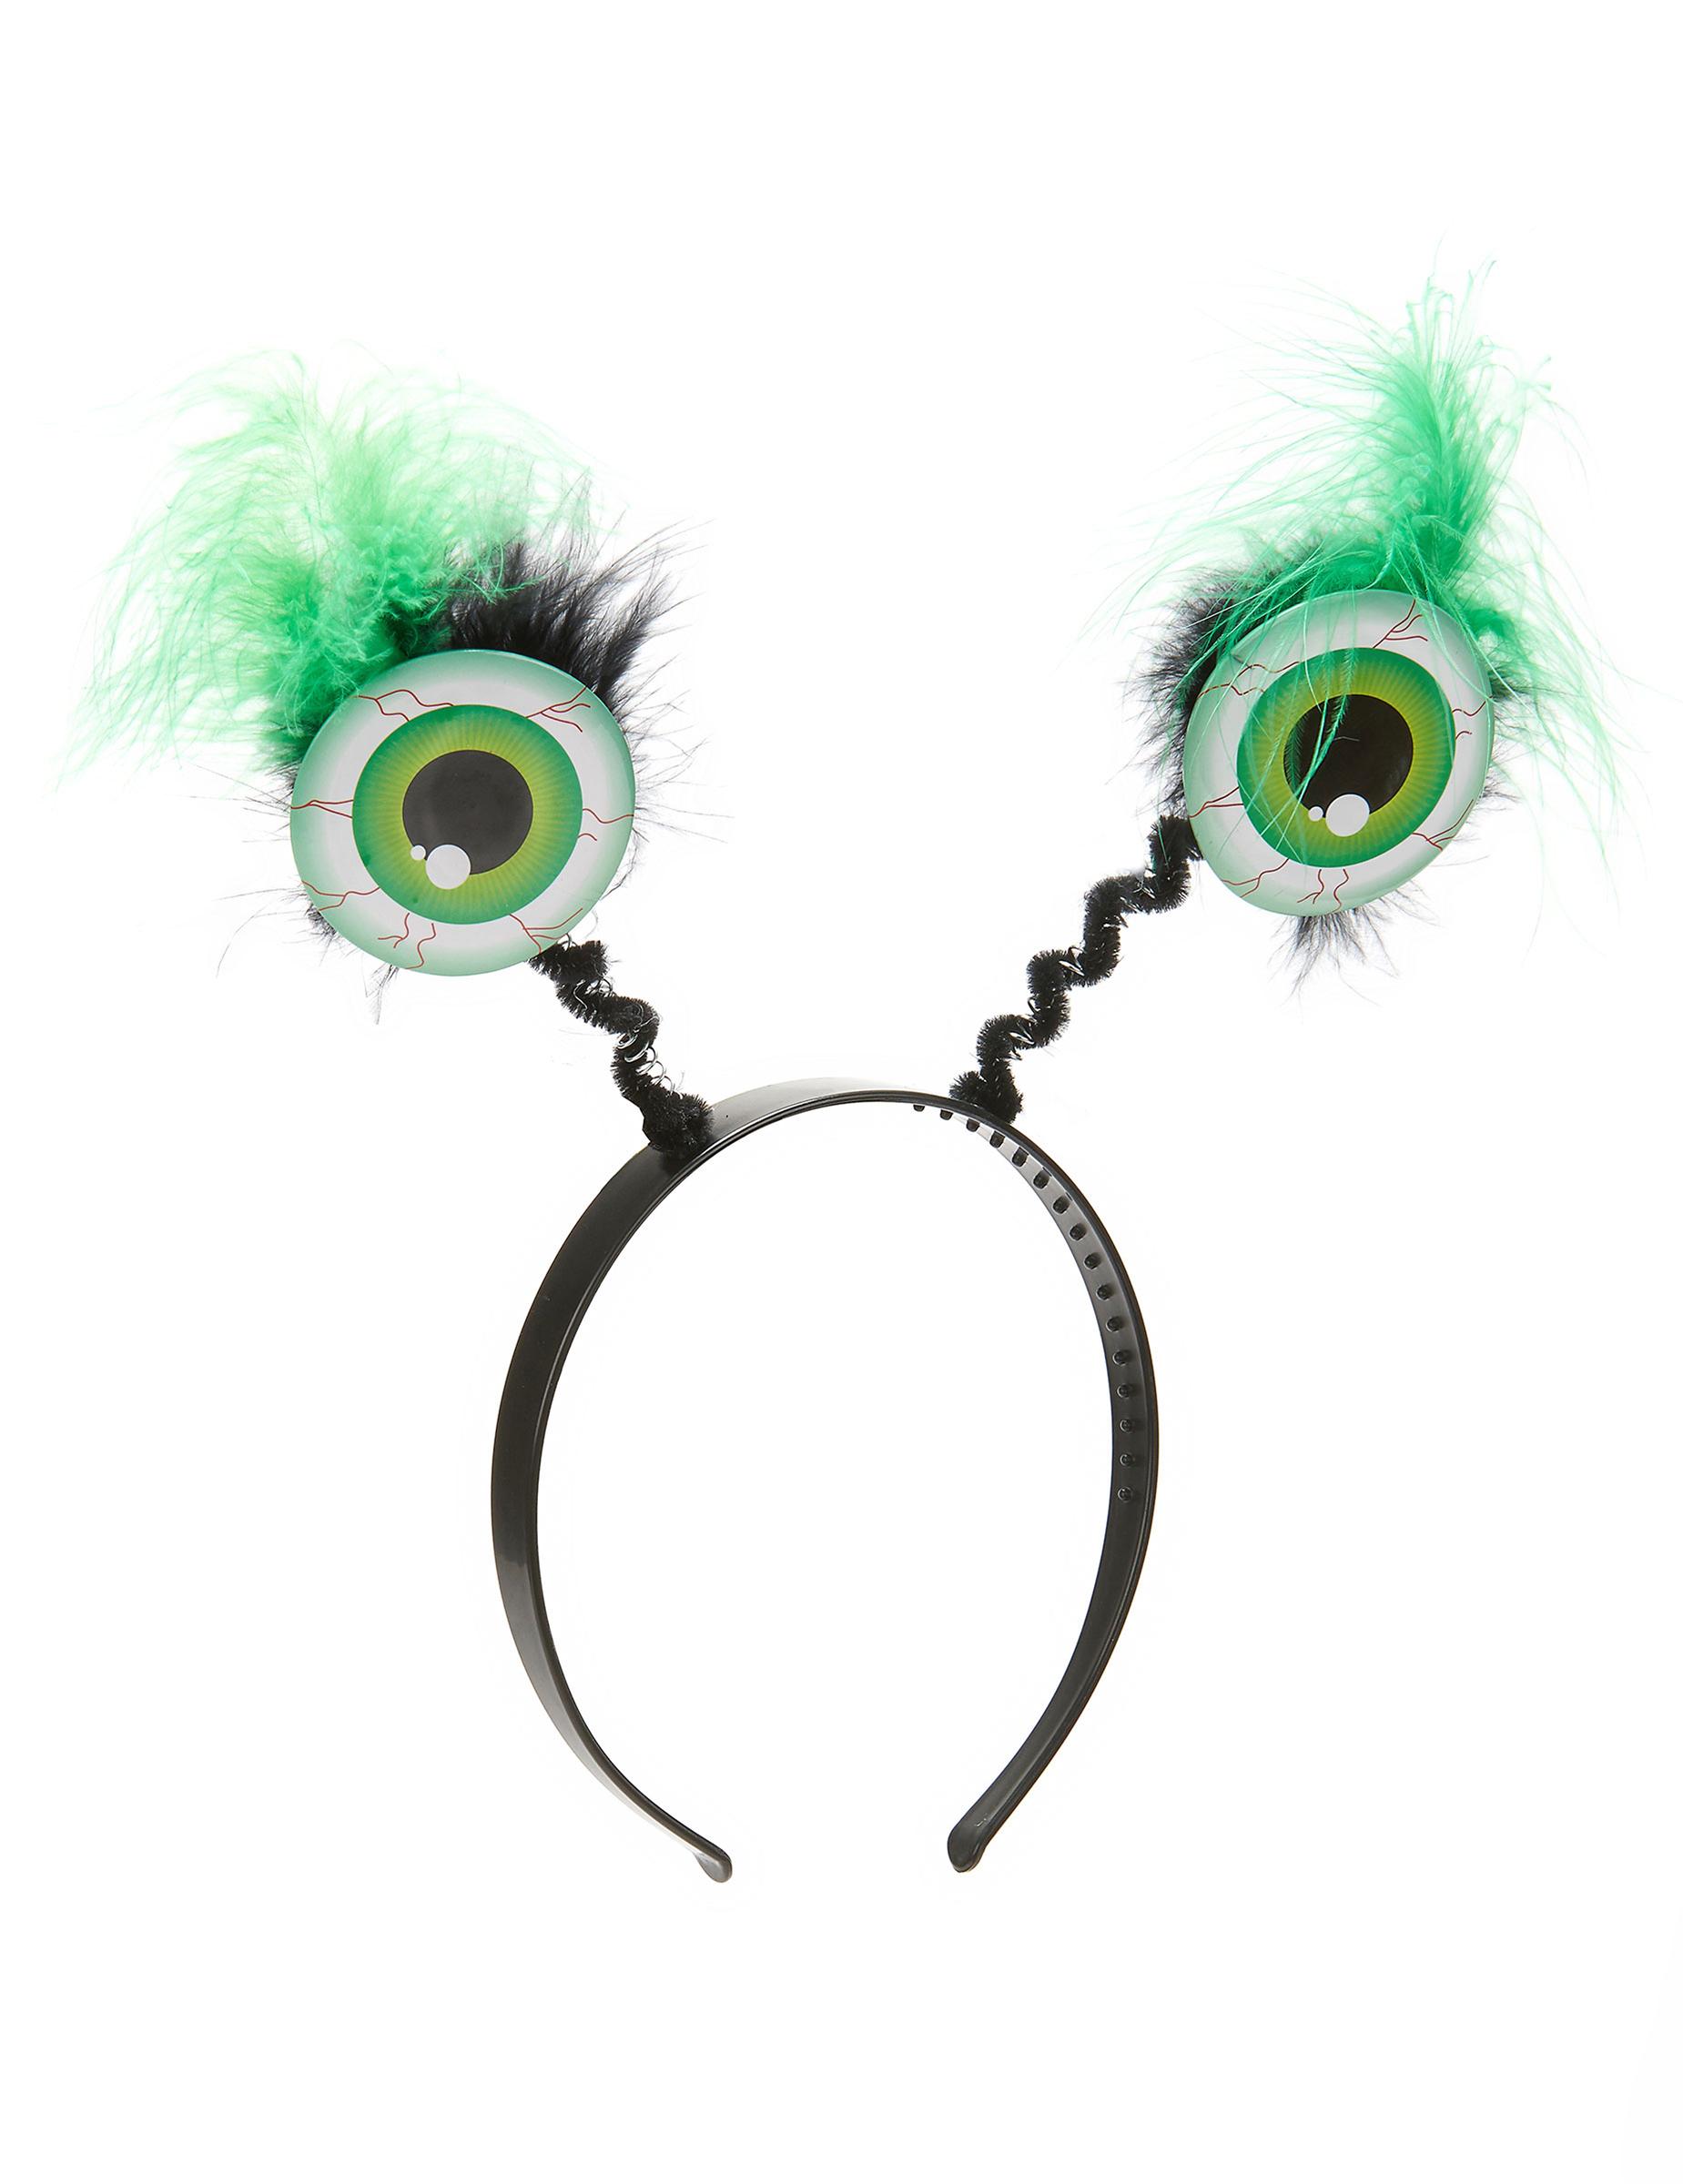 vendite all'ingrosso vendita calda all'ingrosso online Cerchietto occhi verdi